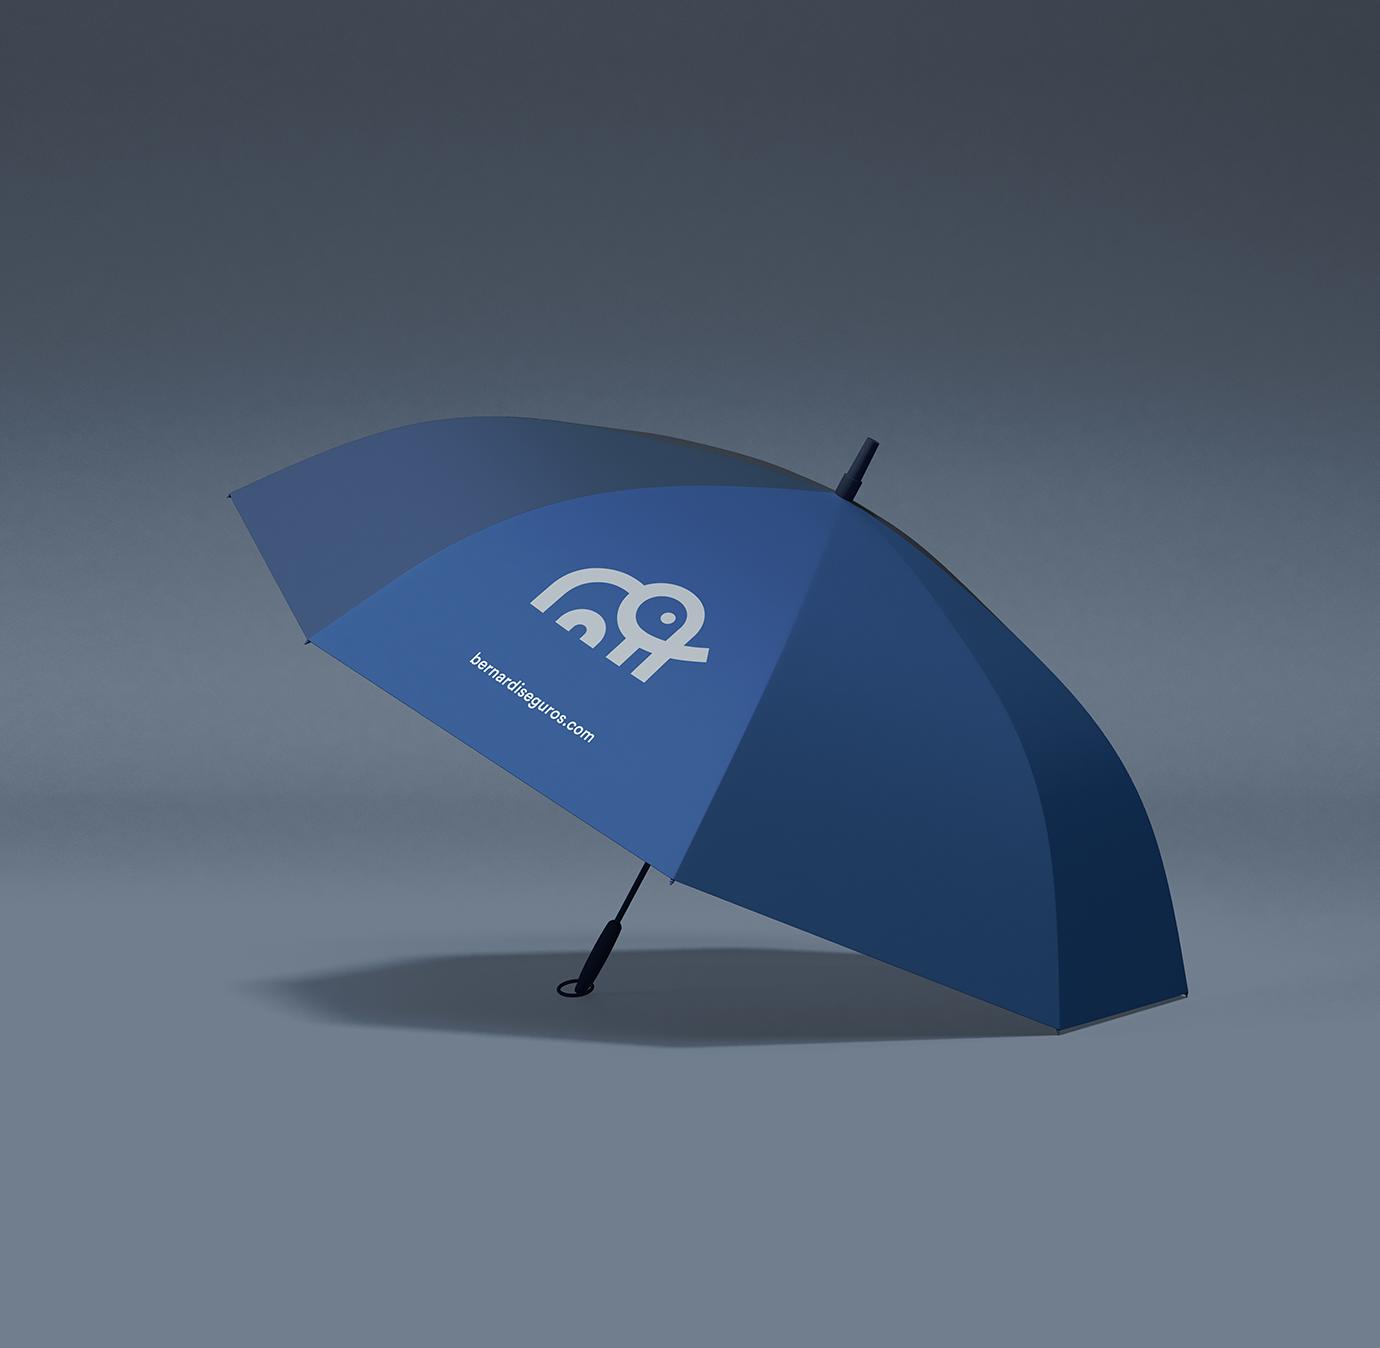 umbrella_bernardi_seguros_yoenpaperland